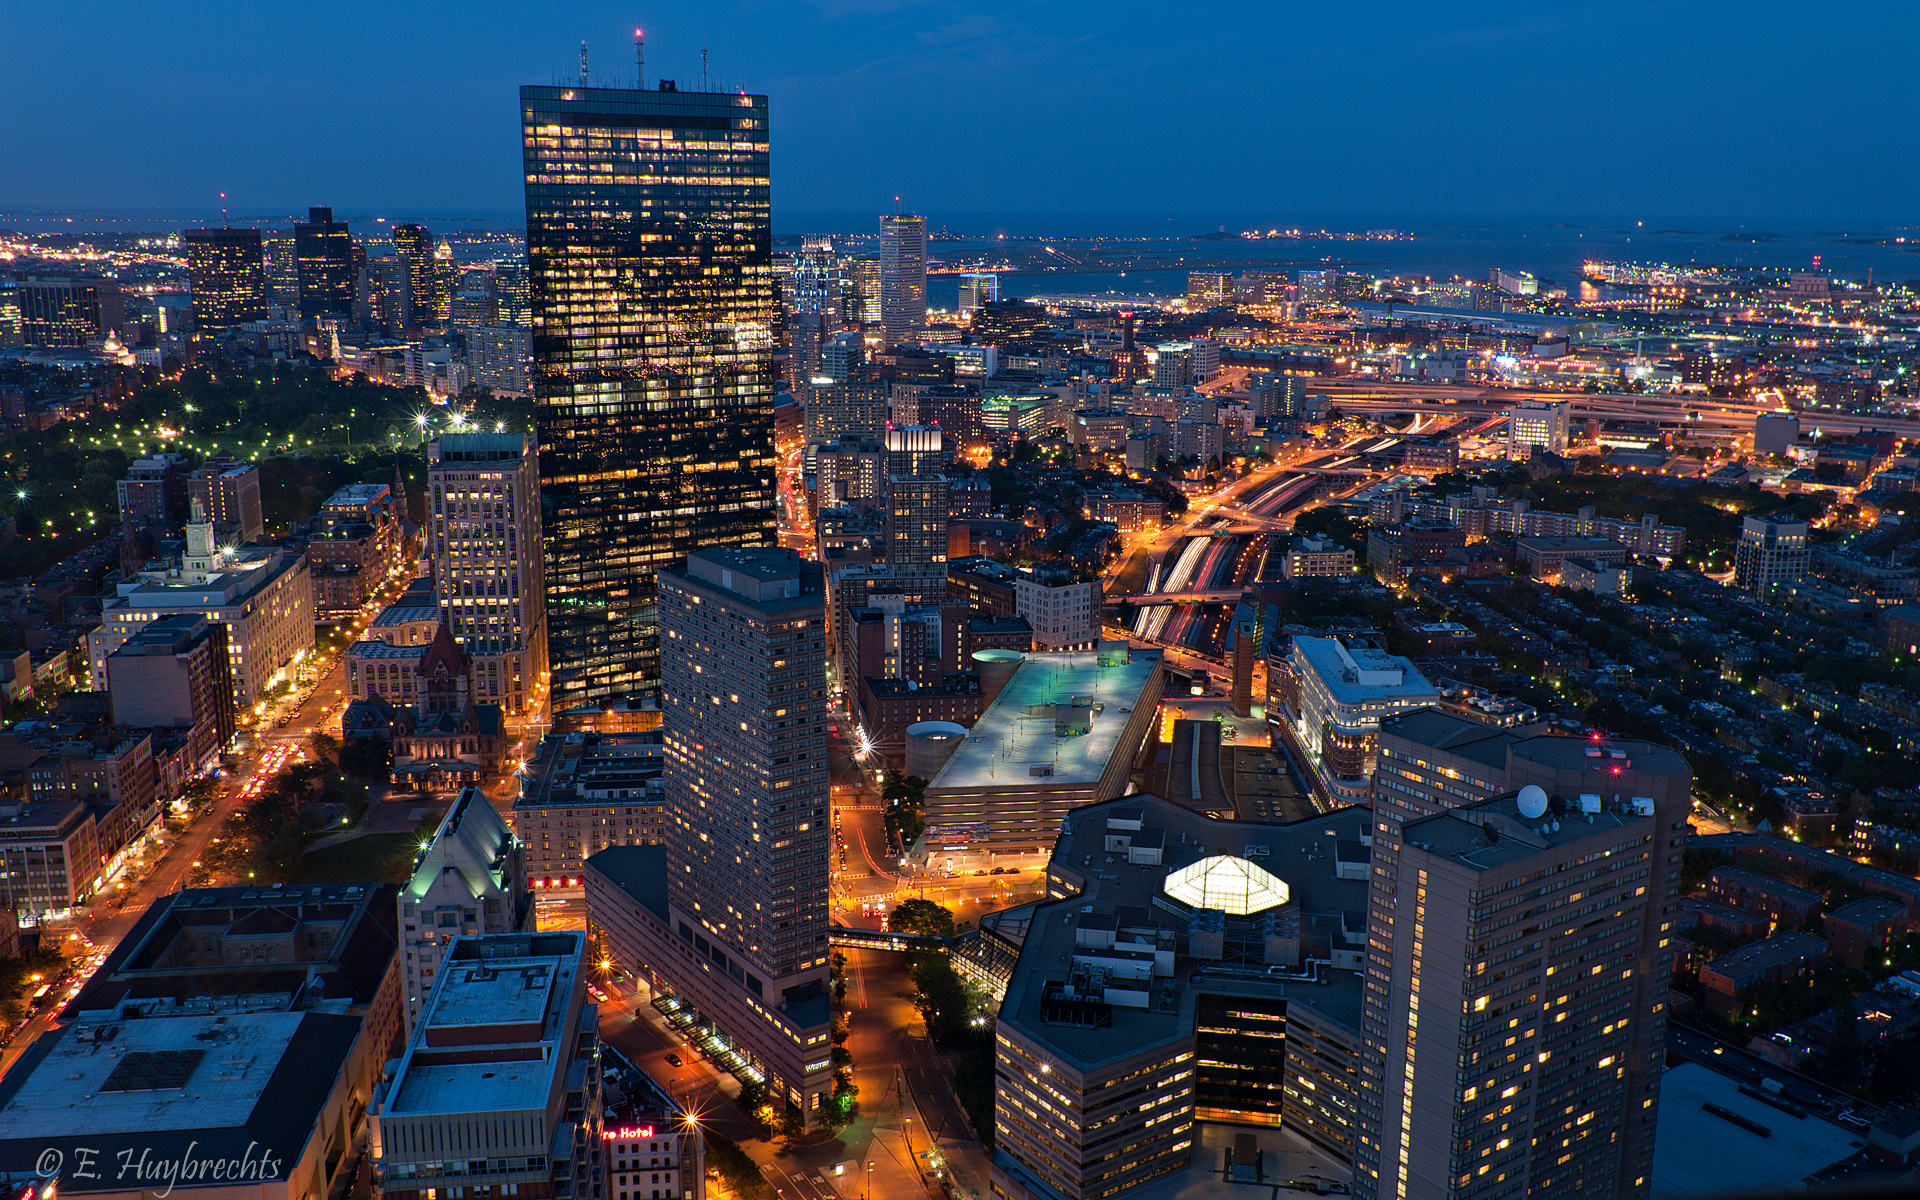 Boston � l'heure bleue - Blue Hour Boston